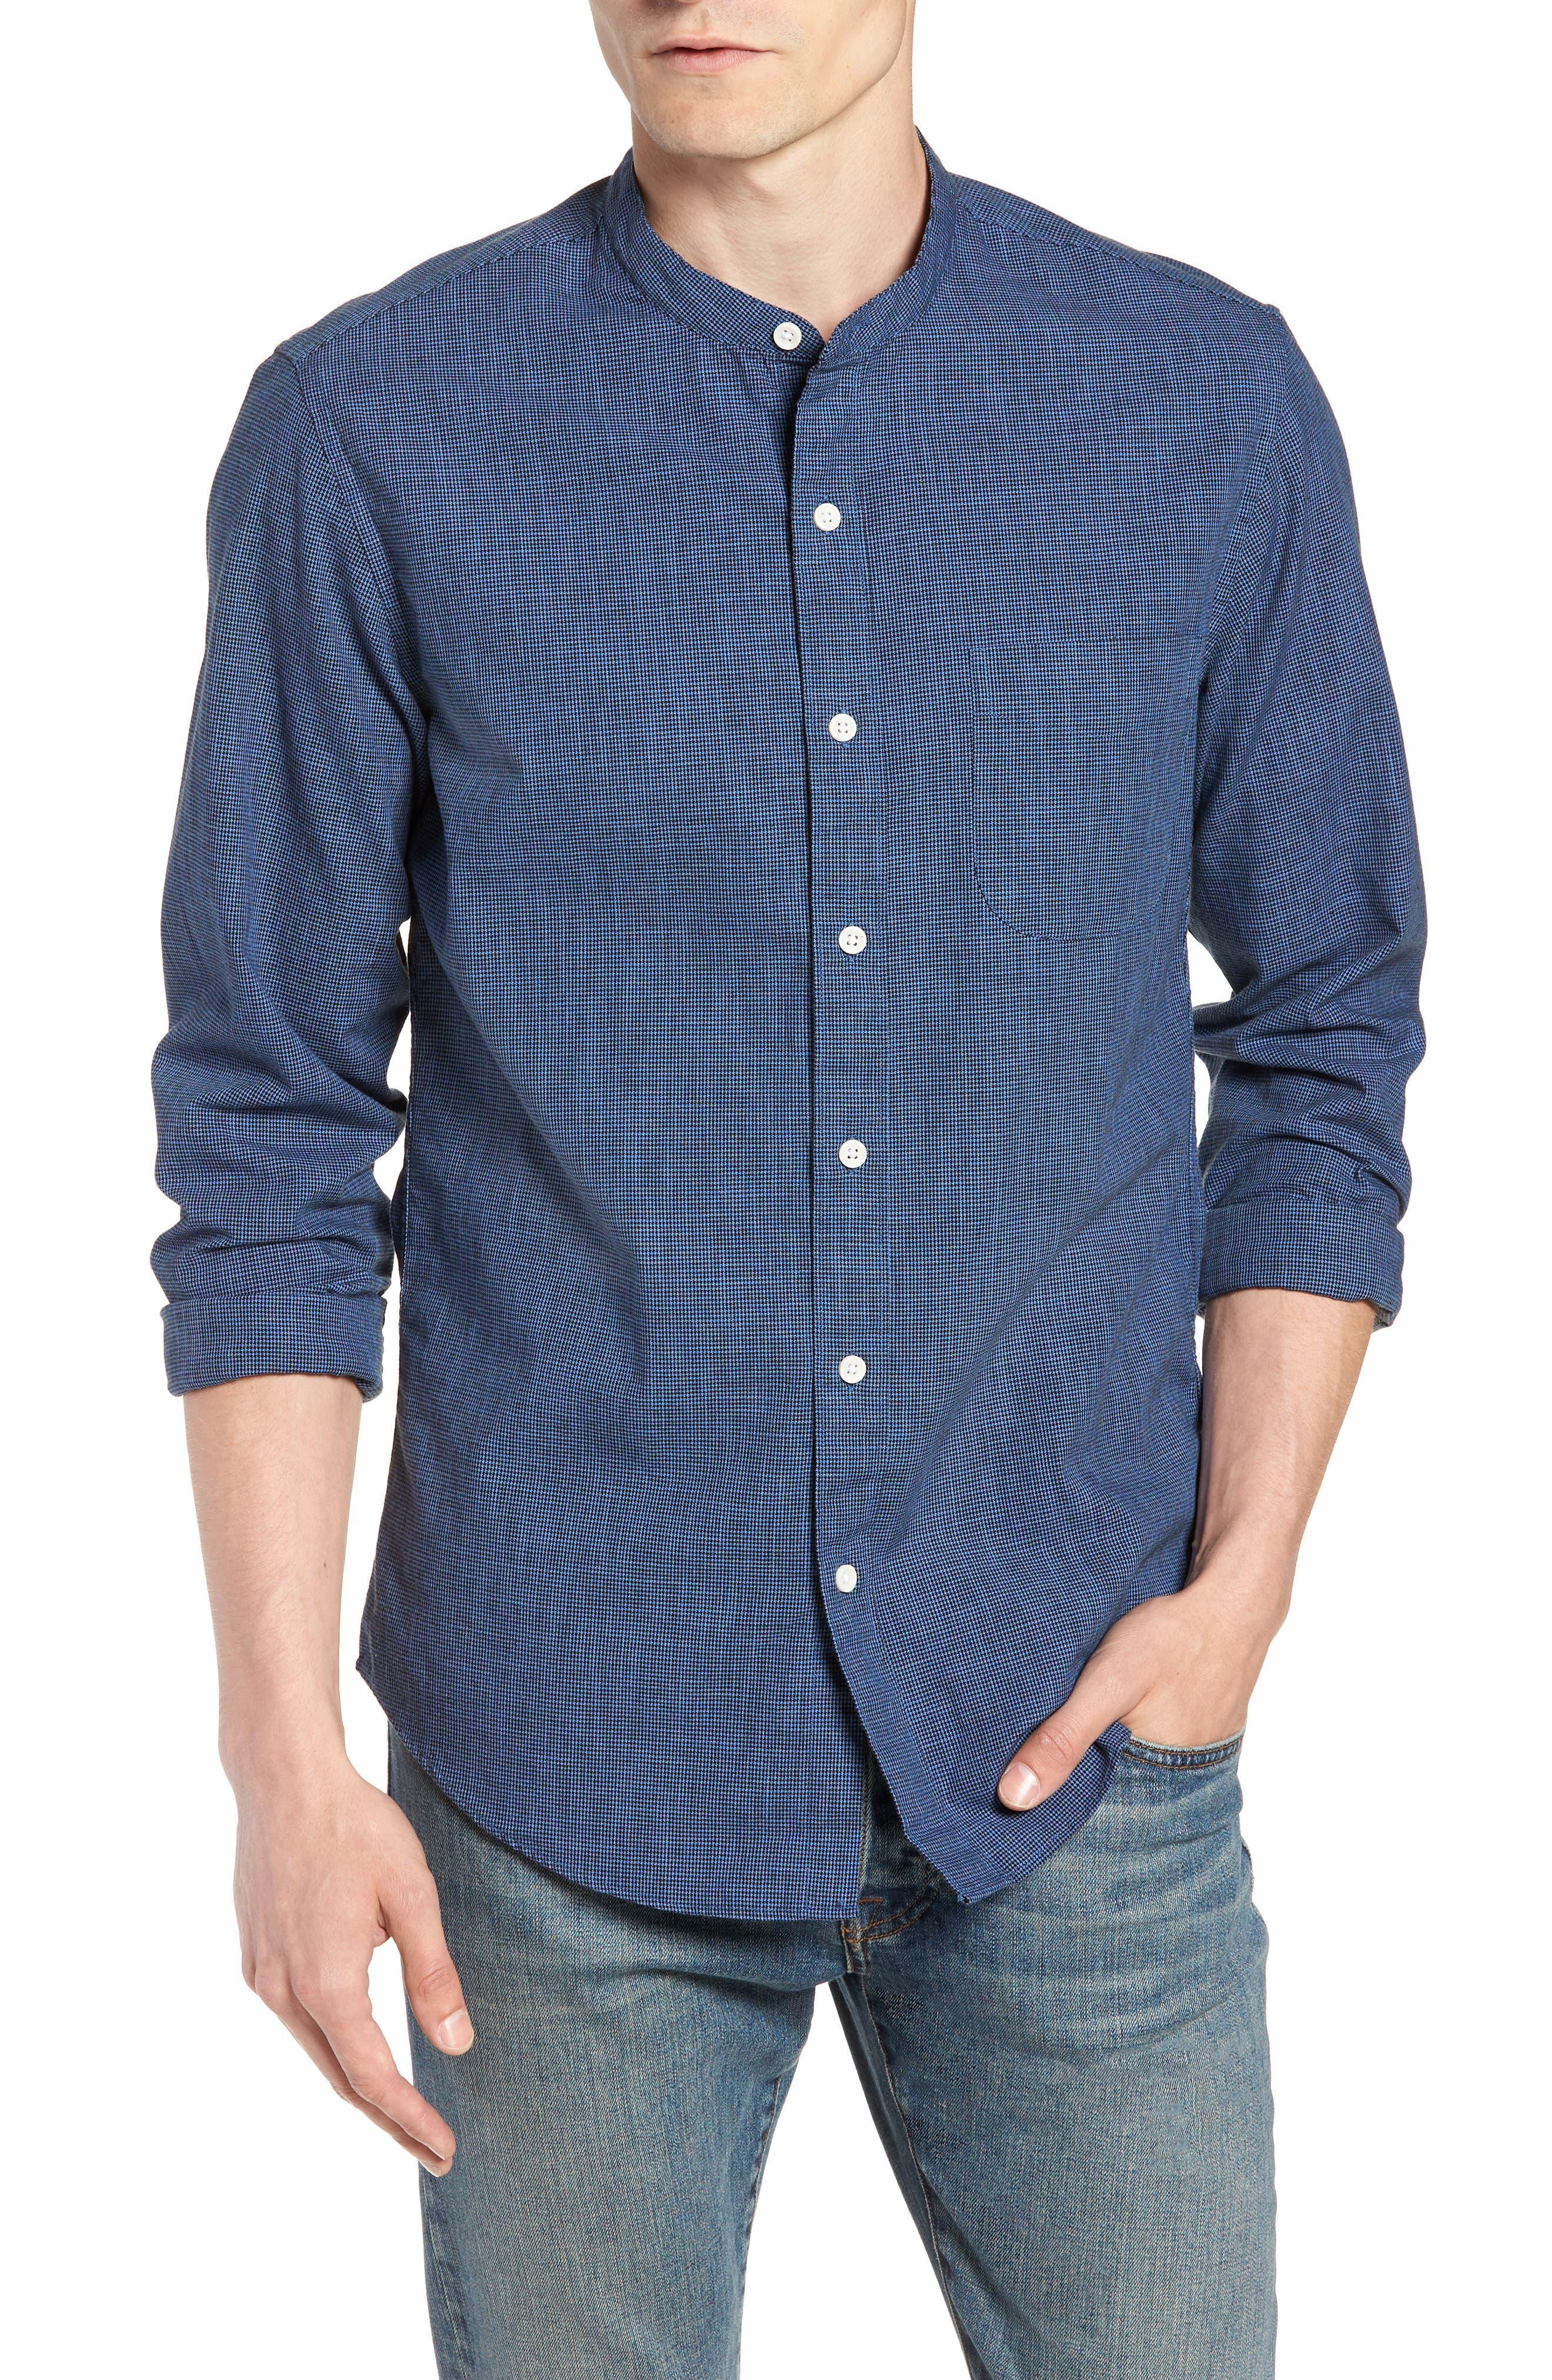 Slim Fit Band Collar Shirt,                             Main thumbnail 1, color,                             DARK EVENING